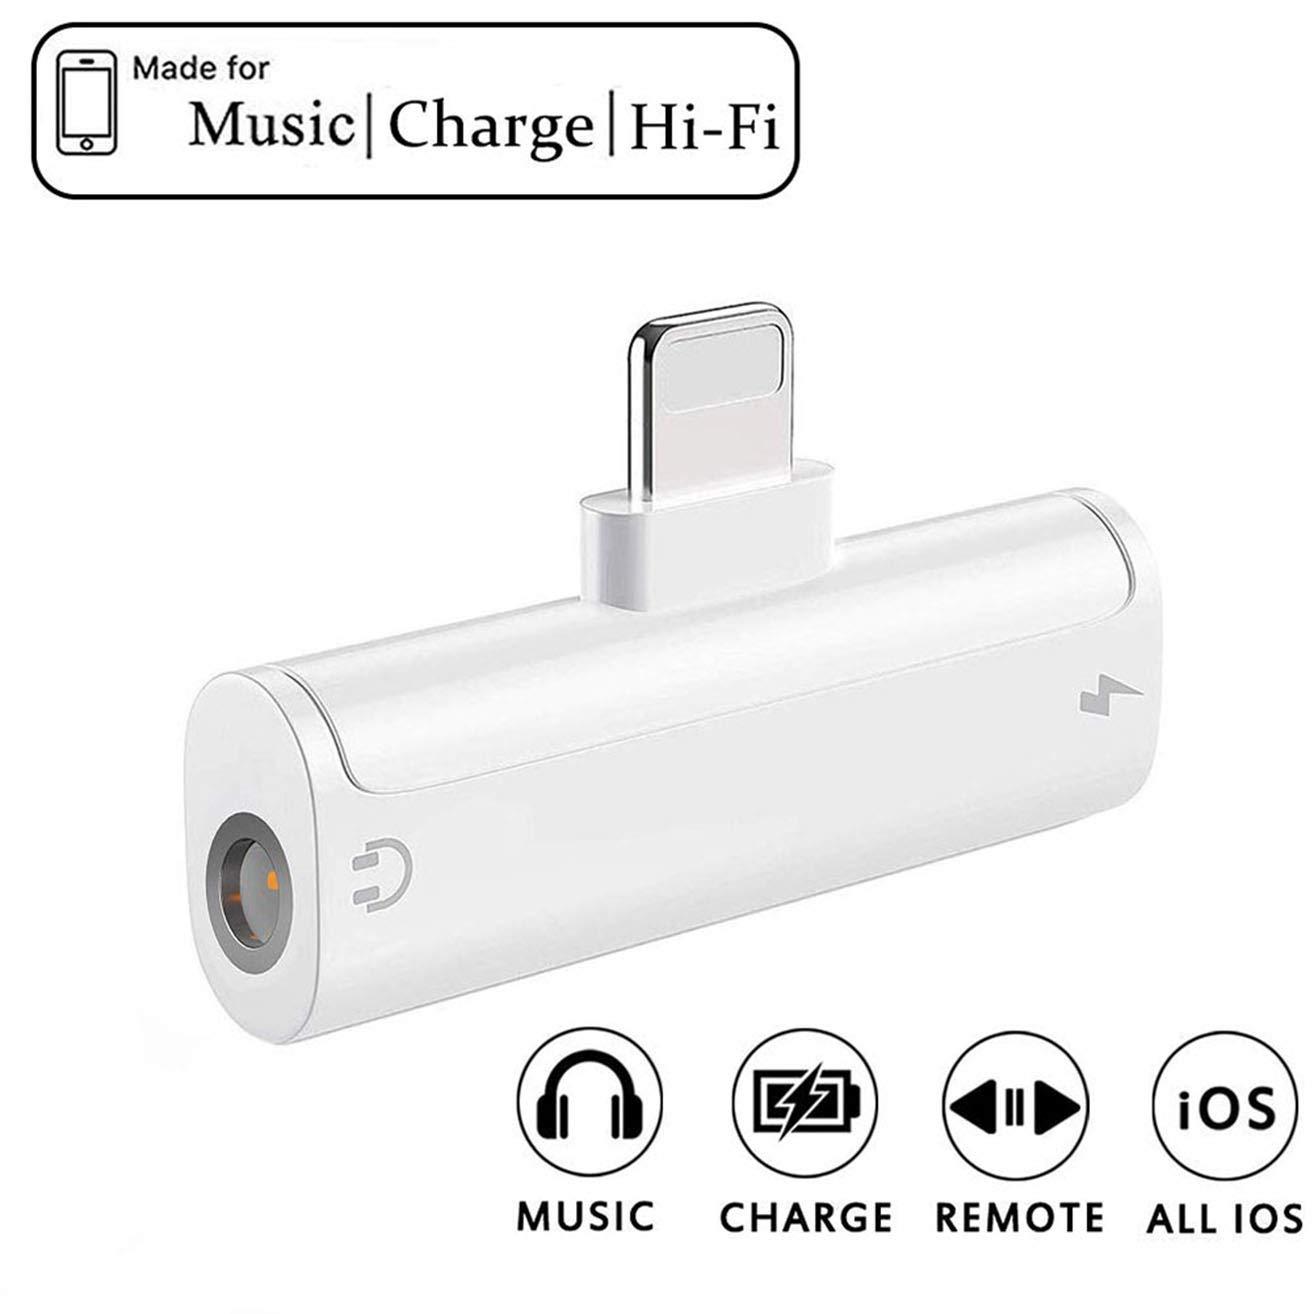 Kopfh/örer Adapter f/ür iPhone 7 Adapter 3,5mm Klinke Dongle Audio Splitter Lade Adapter f/ür iPhone 11 pro//8//8Plus//7Plus//XR Aux Adapter Zubeh/ör Kabel zum Aux-Audio-Anschluss Unterst/ützung iOS 12-9.1cm